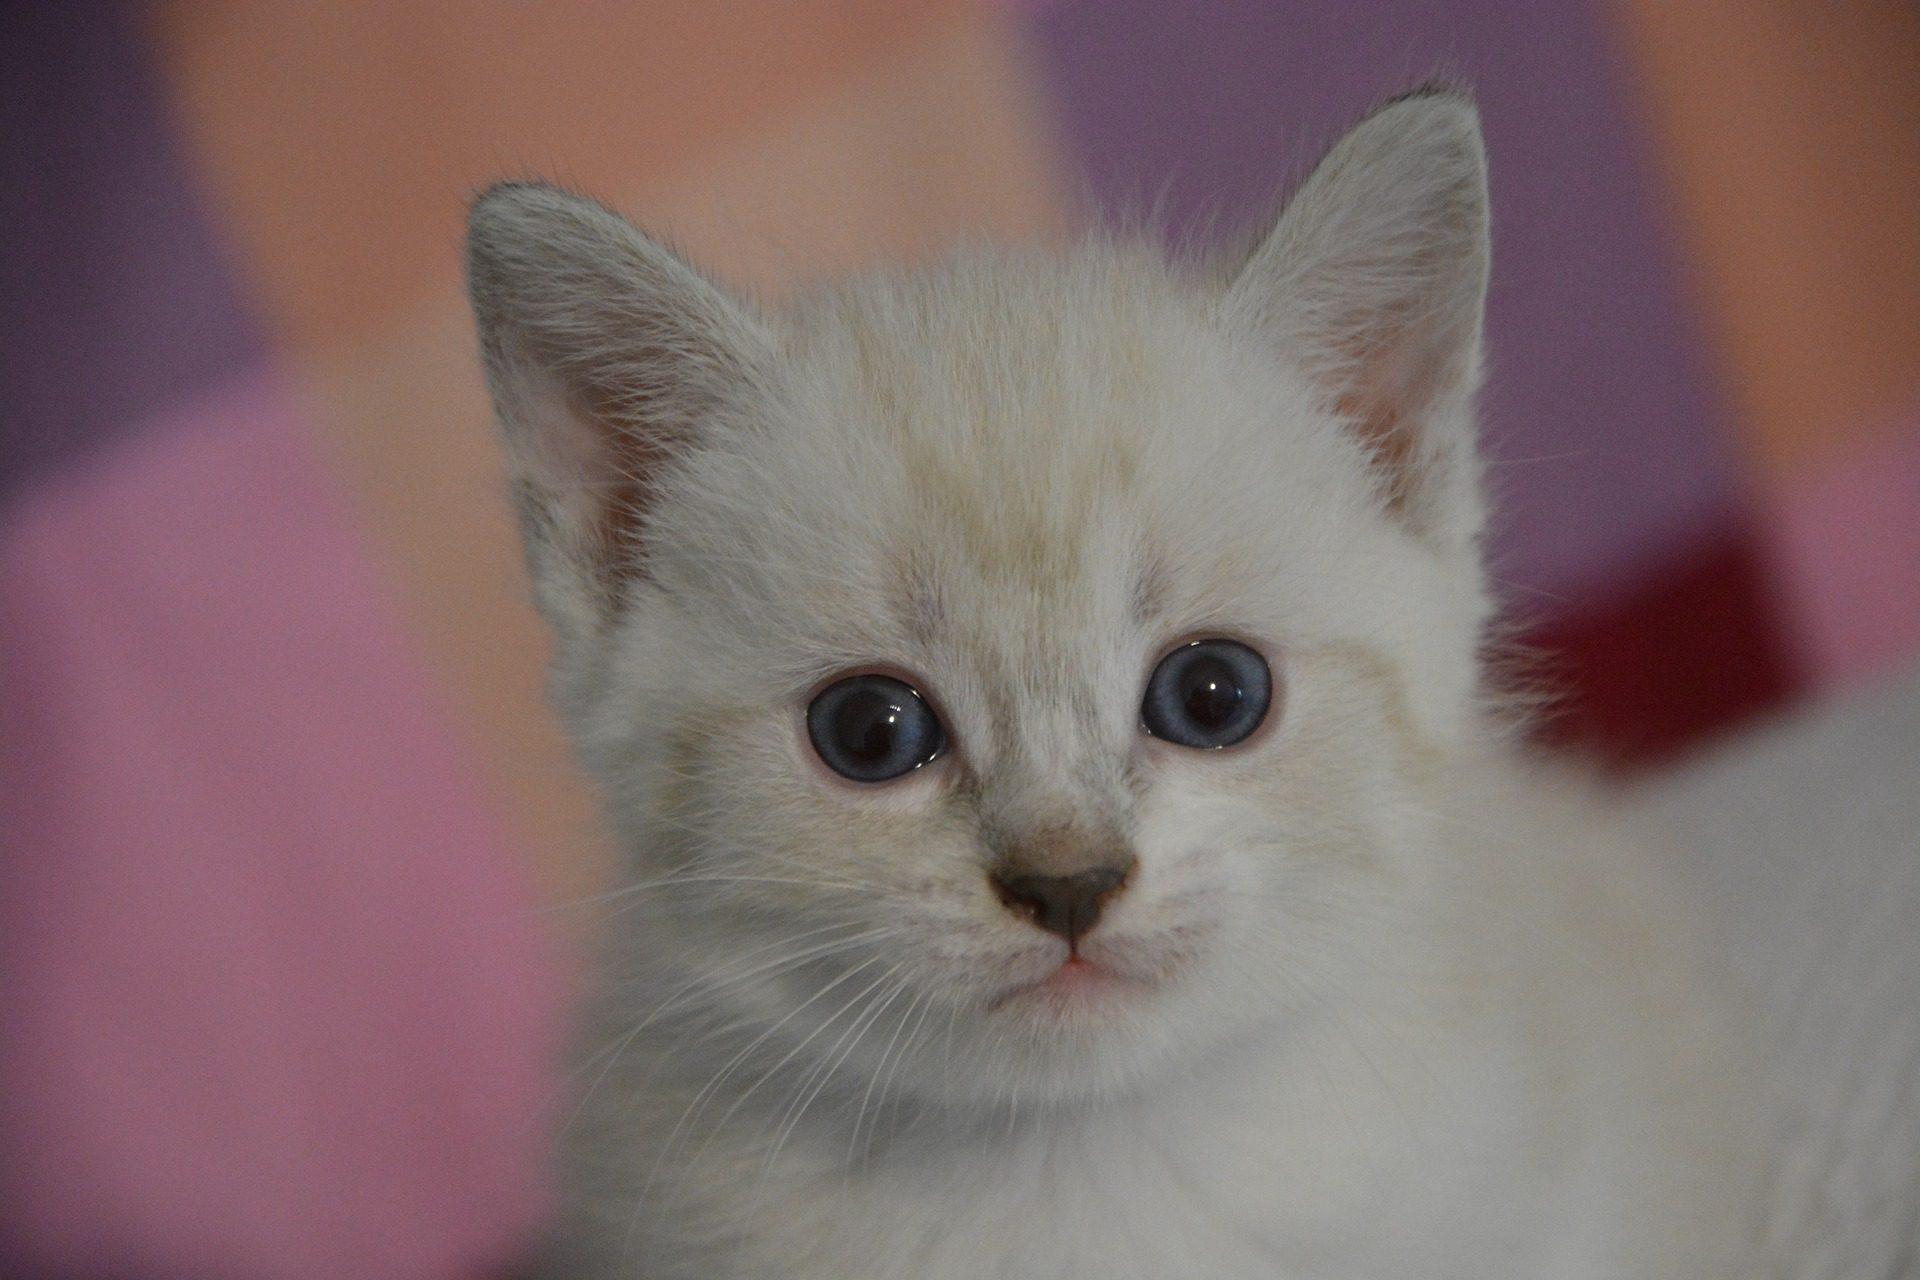 gato, minino, cría, peles, olhos, felino - Papéis de parede HD - Professor-falken.com